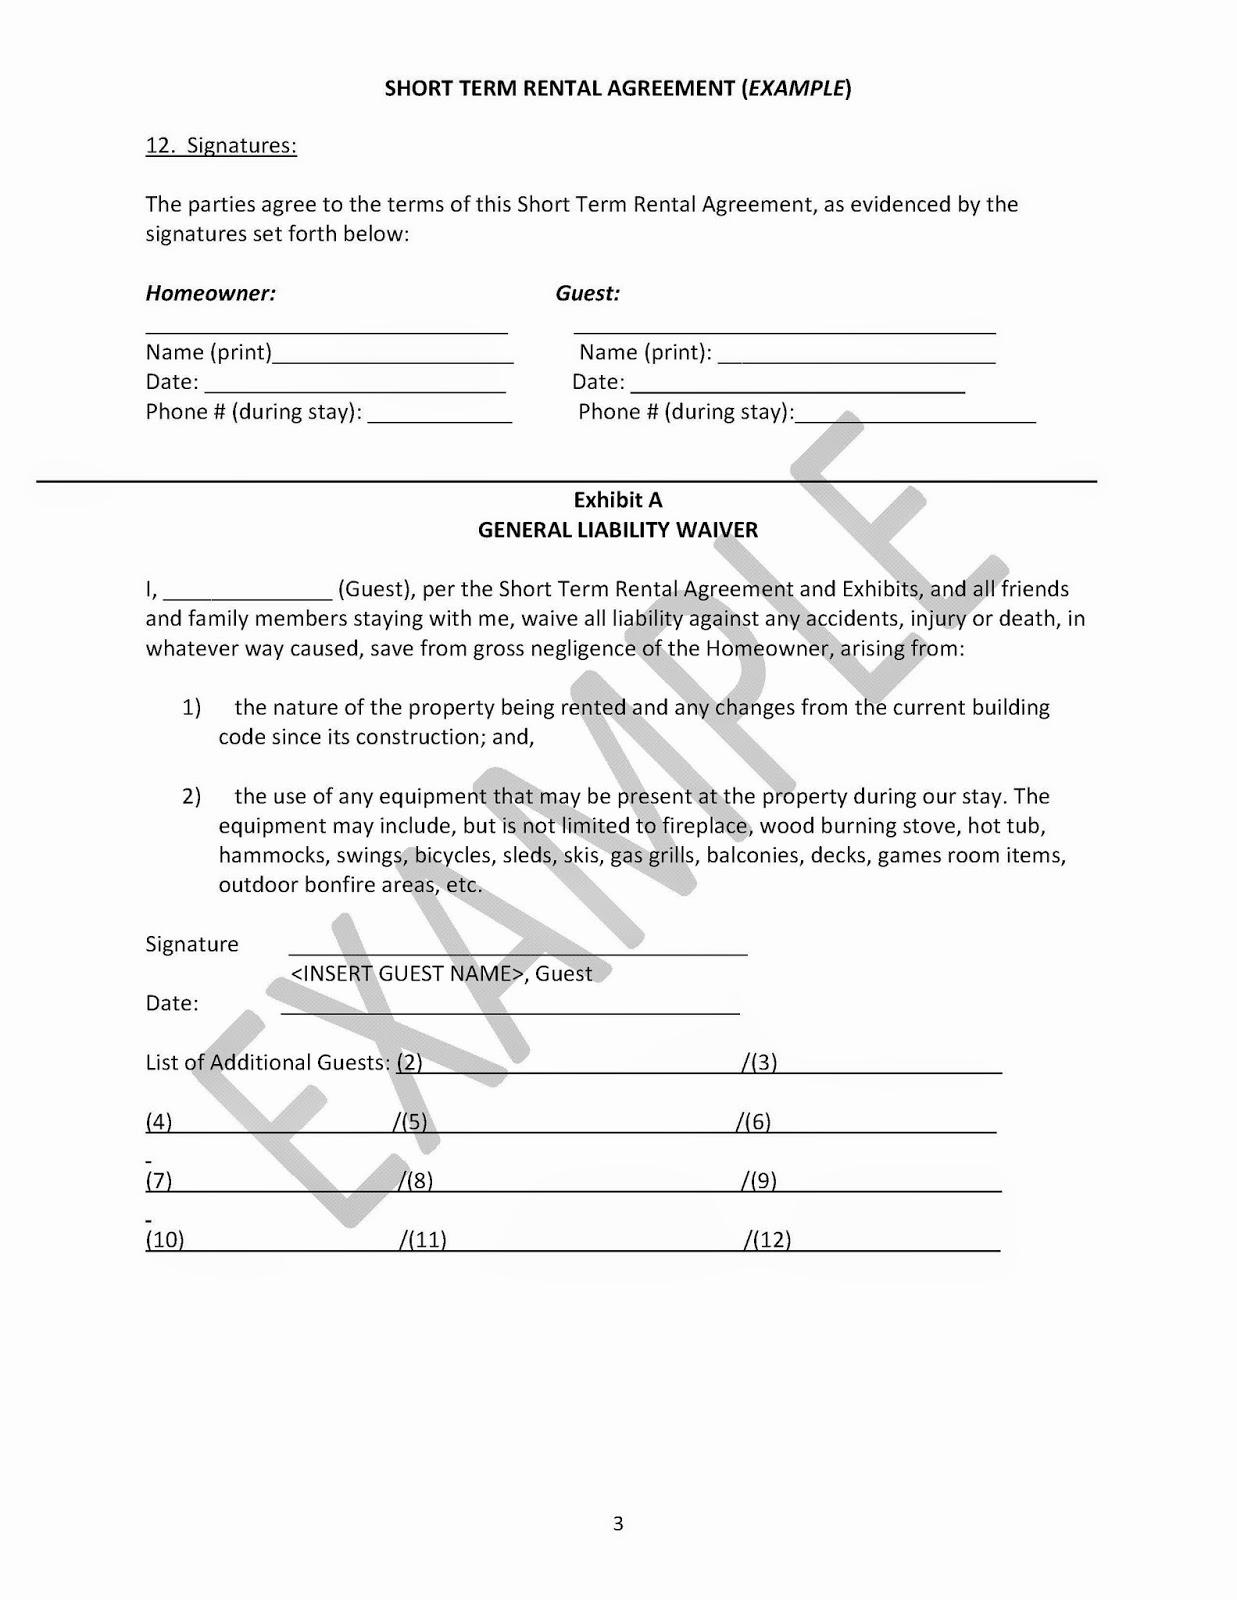 Short Term Rental Agreement Best Of Creekside at Barton Example Short Term Rental Agreement